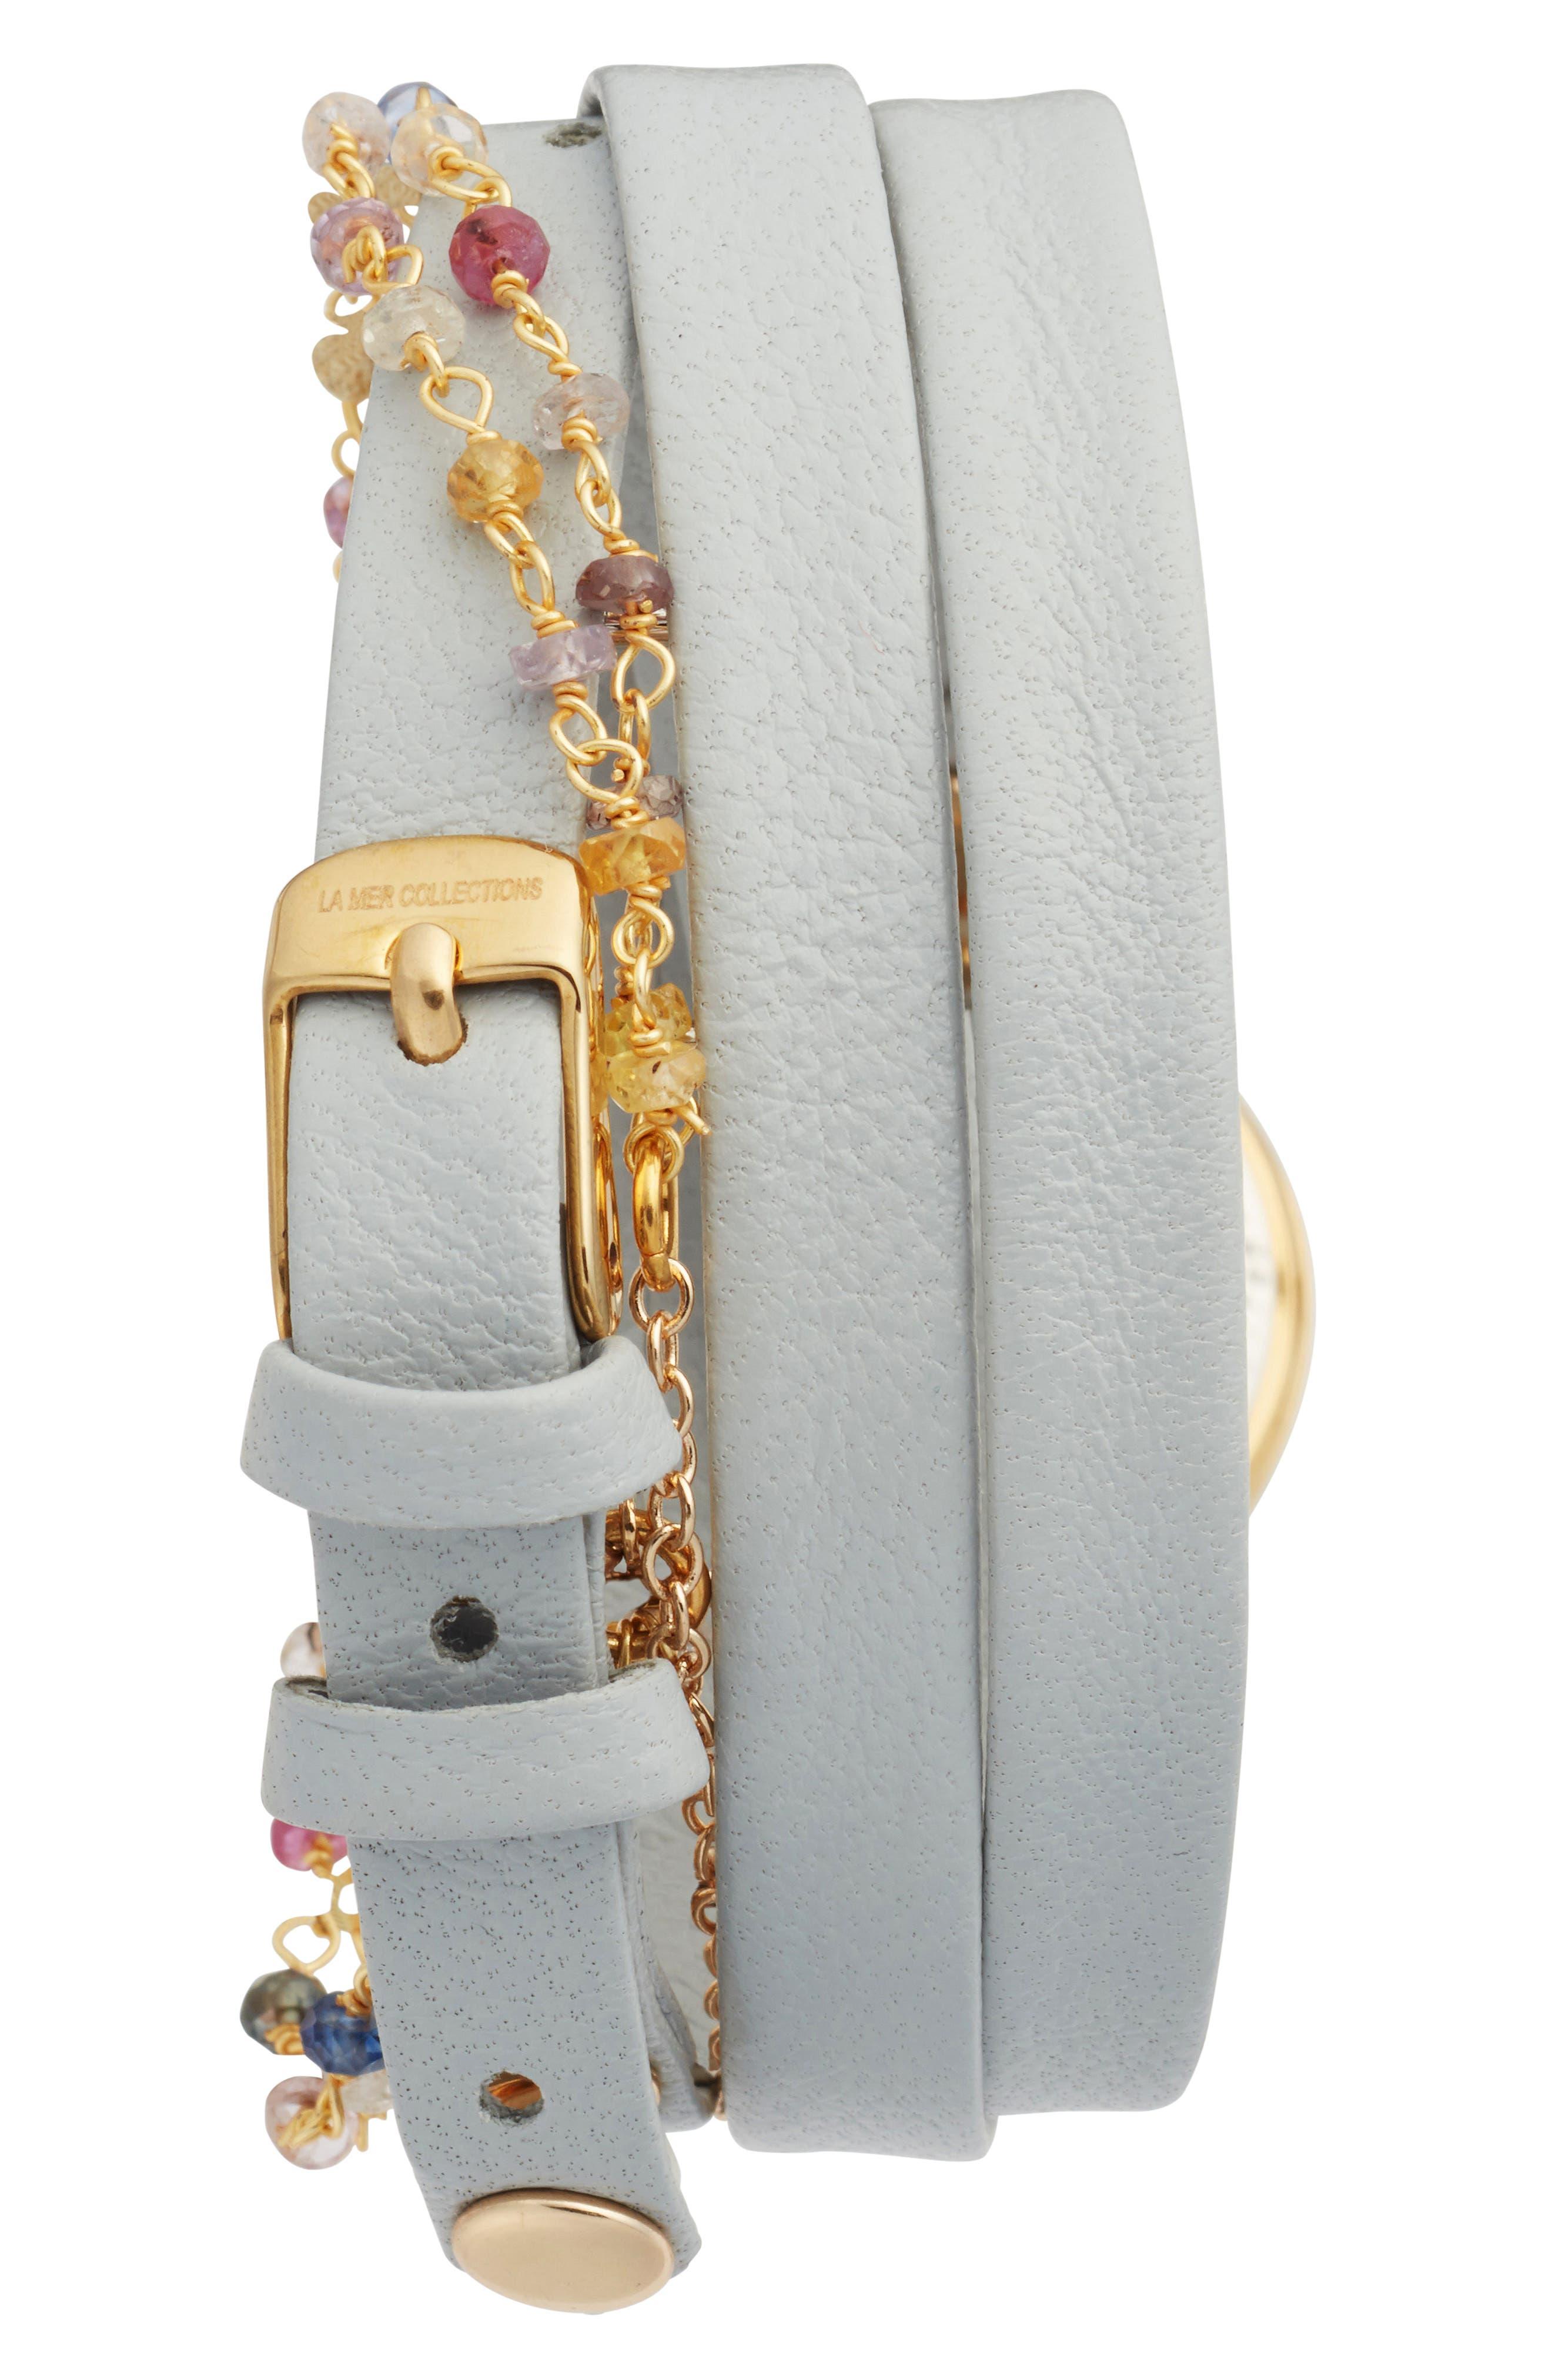 La Mer Nolita Leather Wrap Strap Watch, 22mm,                             Alternate thumbnail 2, color,                             STONE/WHITE/GOLD